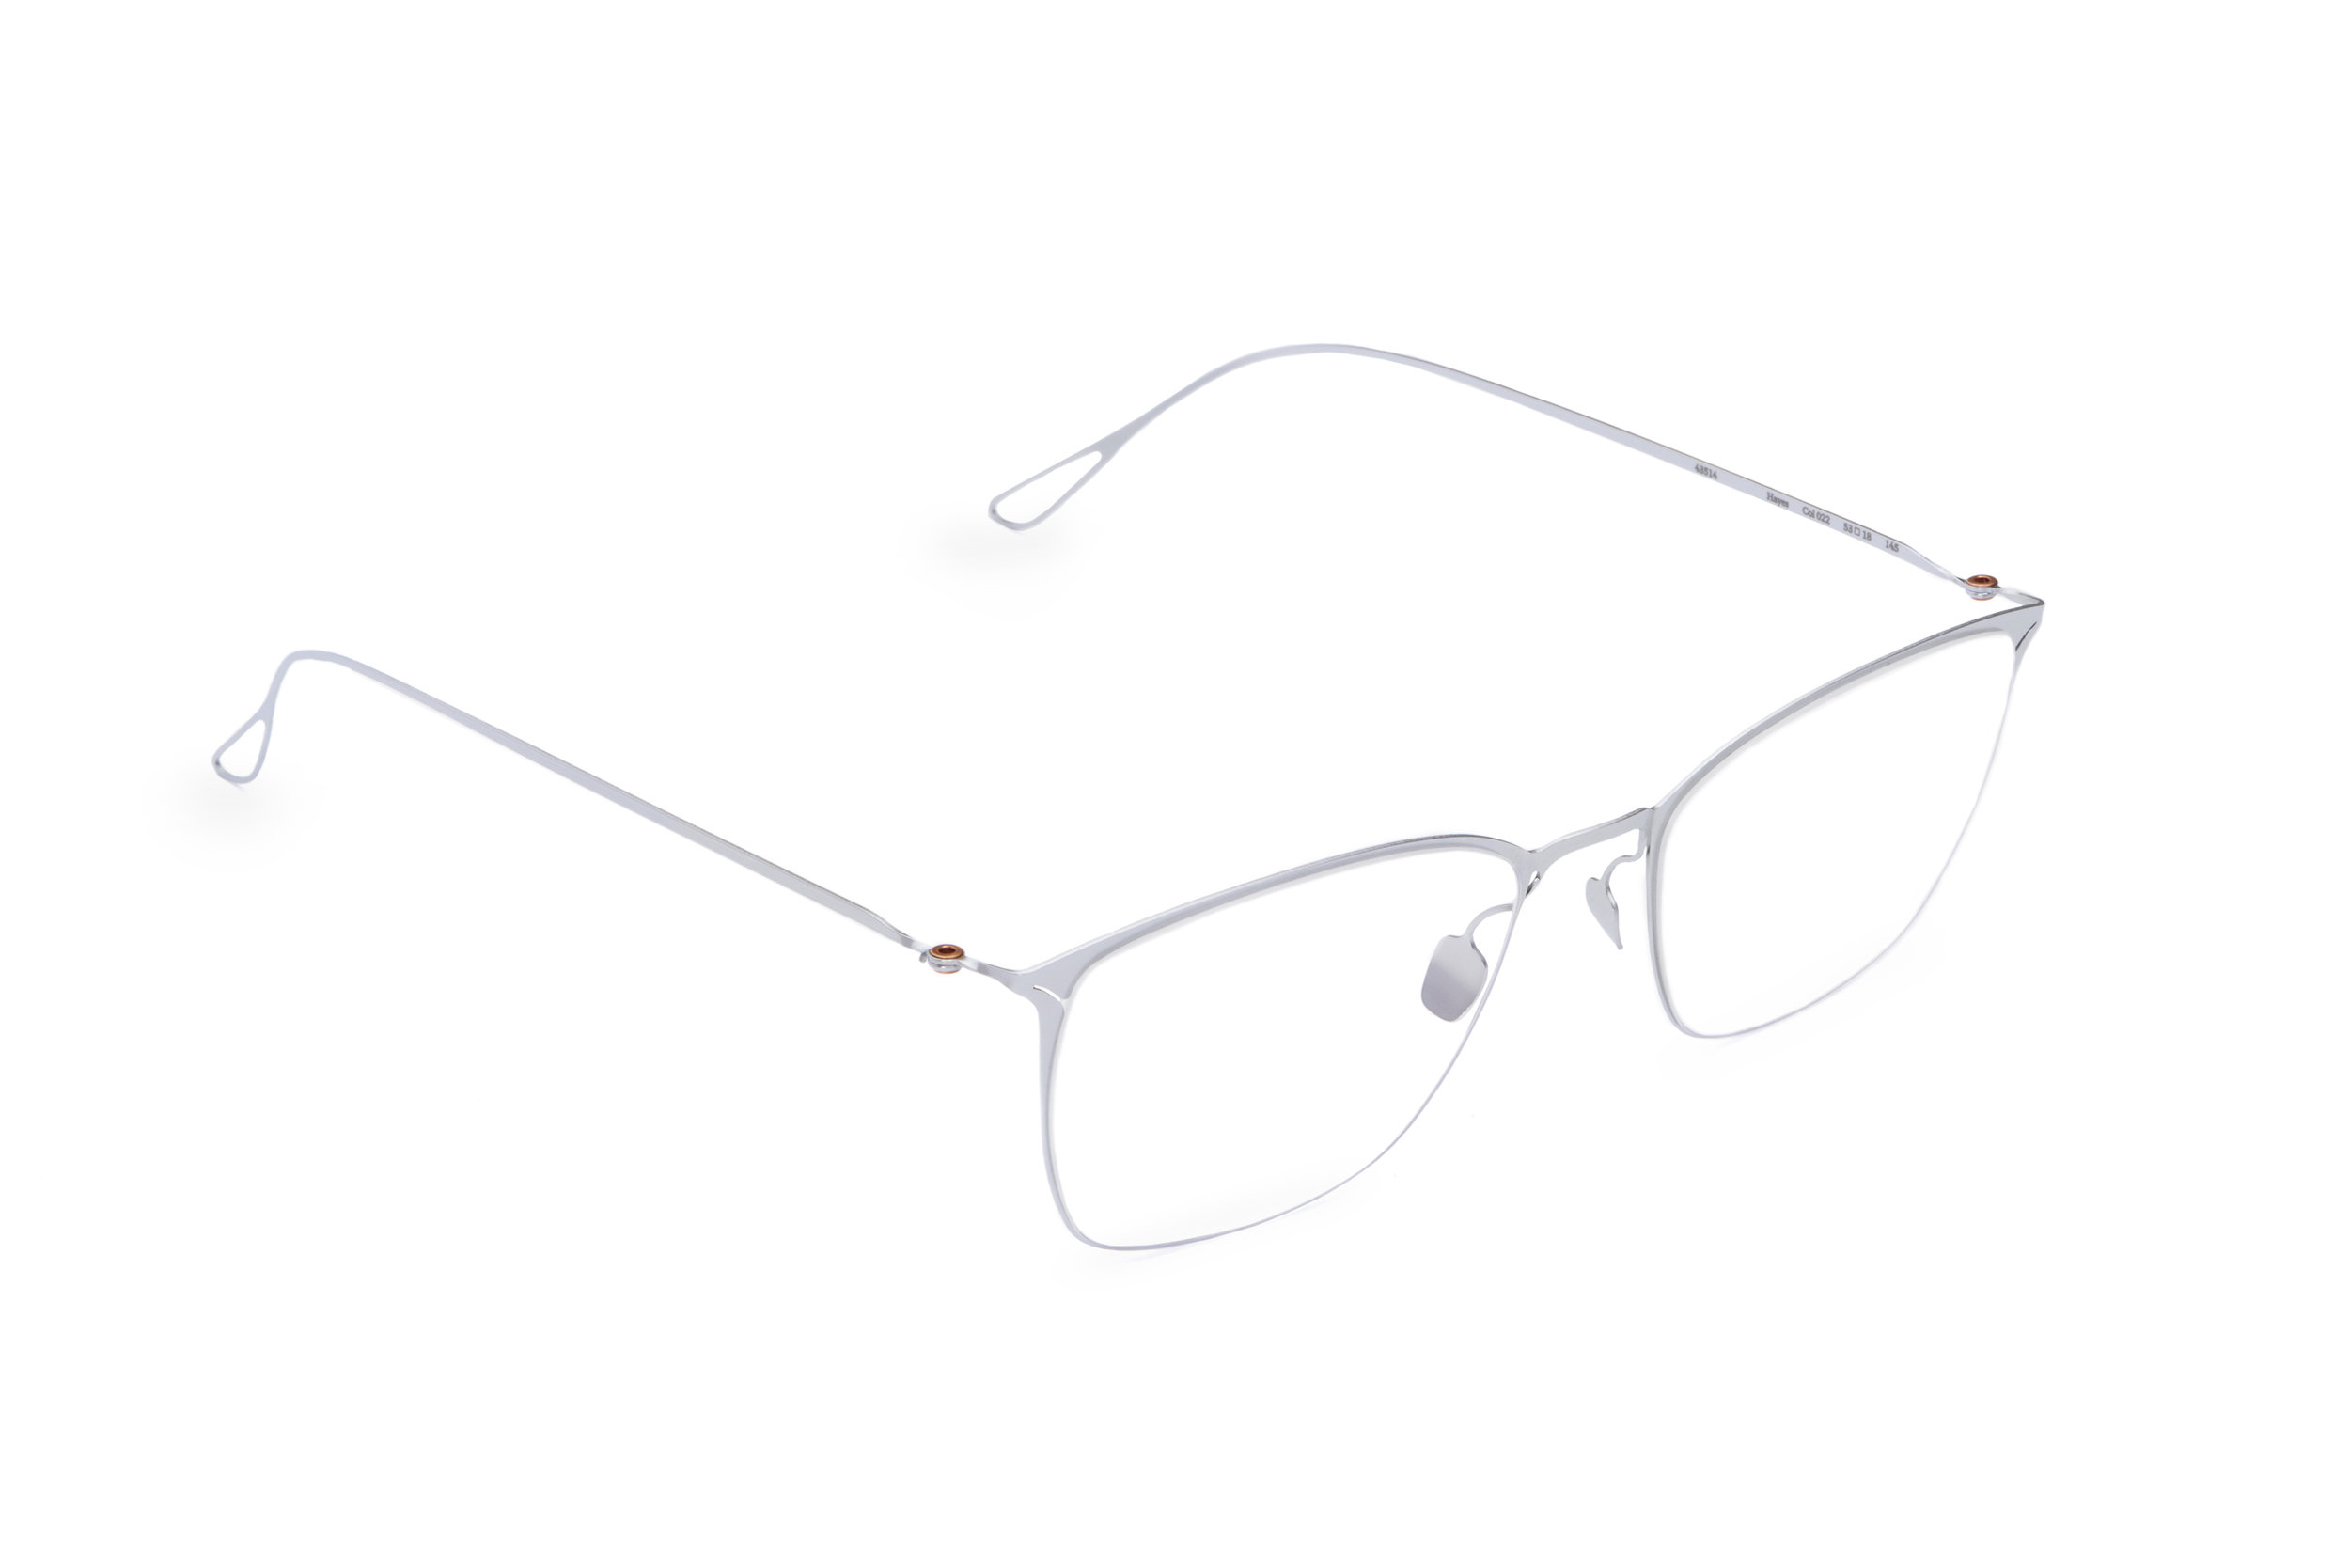 haffmans_neumeister_hayes_airstream_clear_ultralight_eyeglasses_angle_102450.jpg